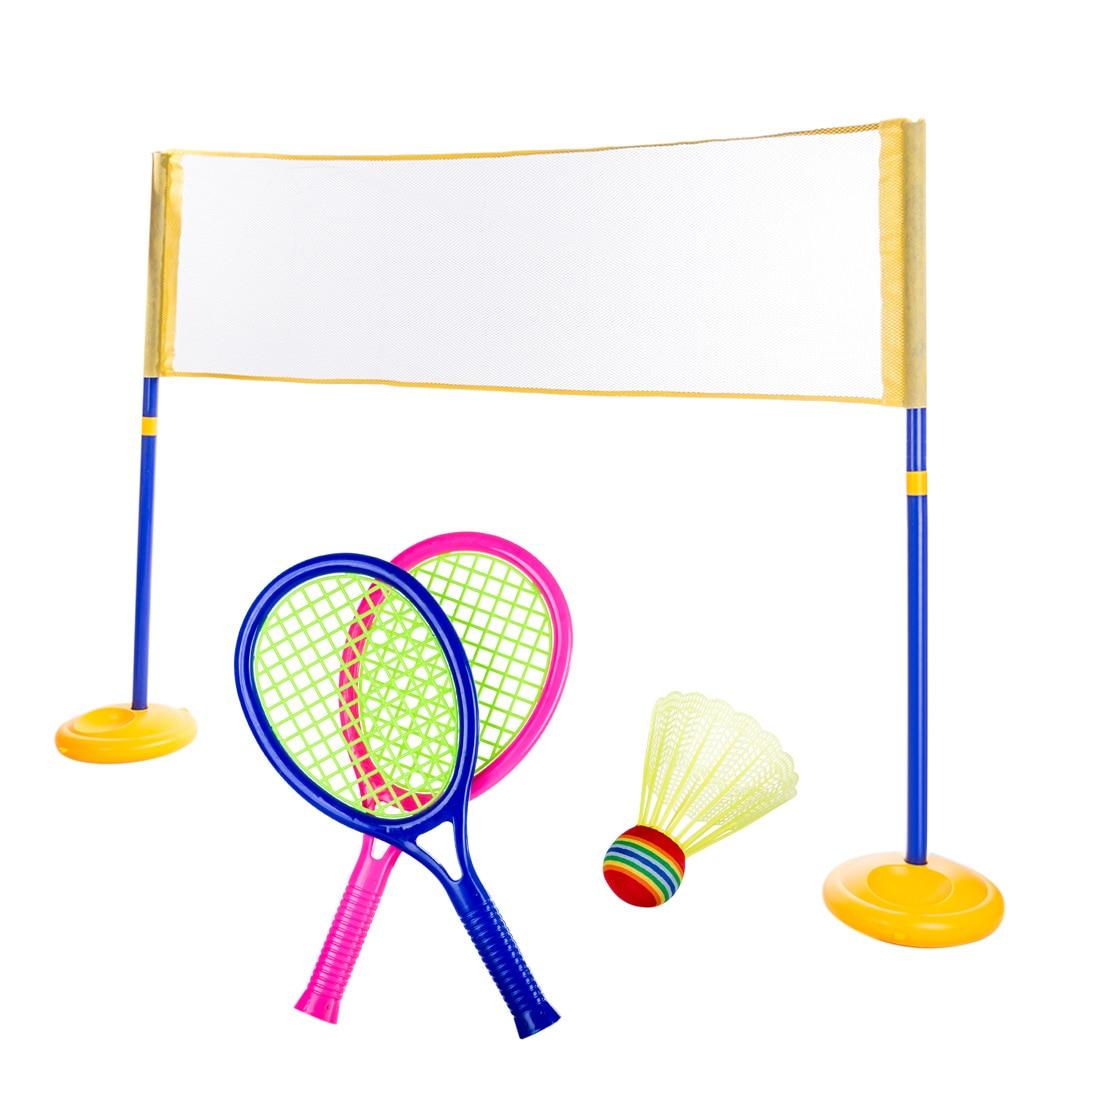 2-In-1 Children Tennis Badminton Net Racket Sports Toy Set Outdoor Educational Sports Toys Parent-Child Sport Educational Toys